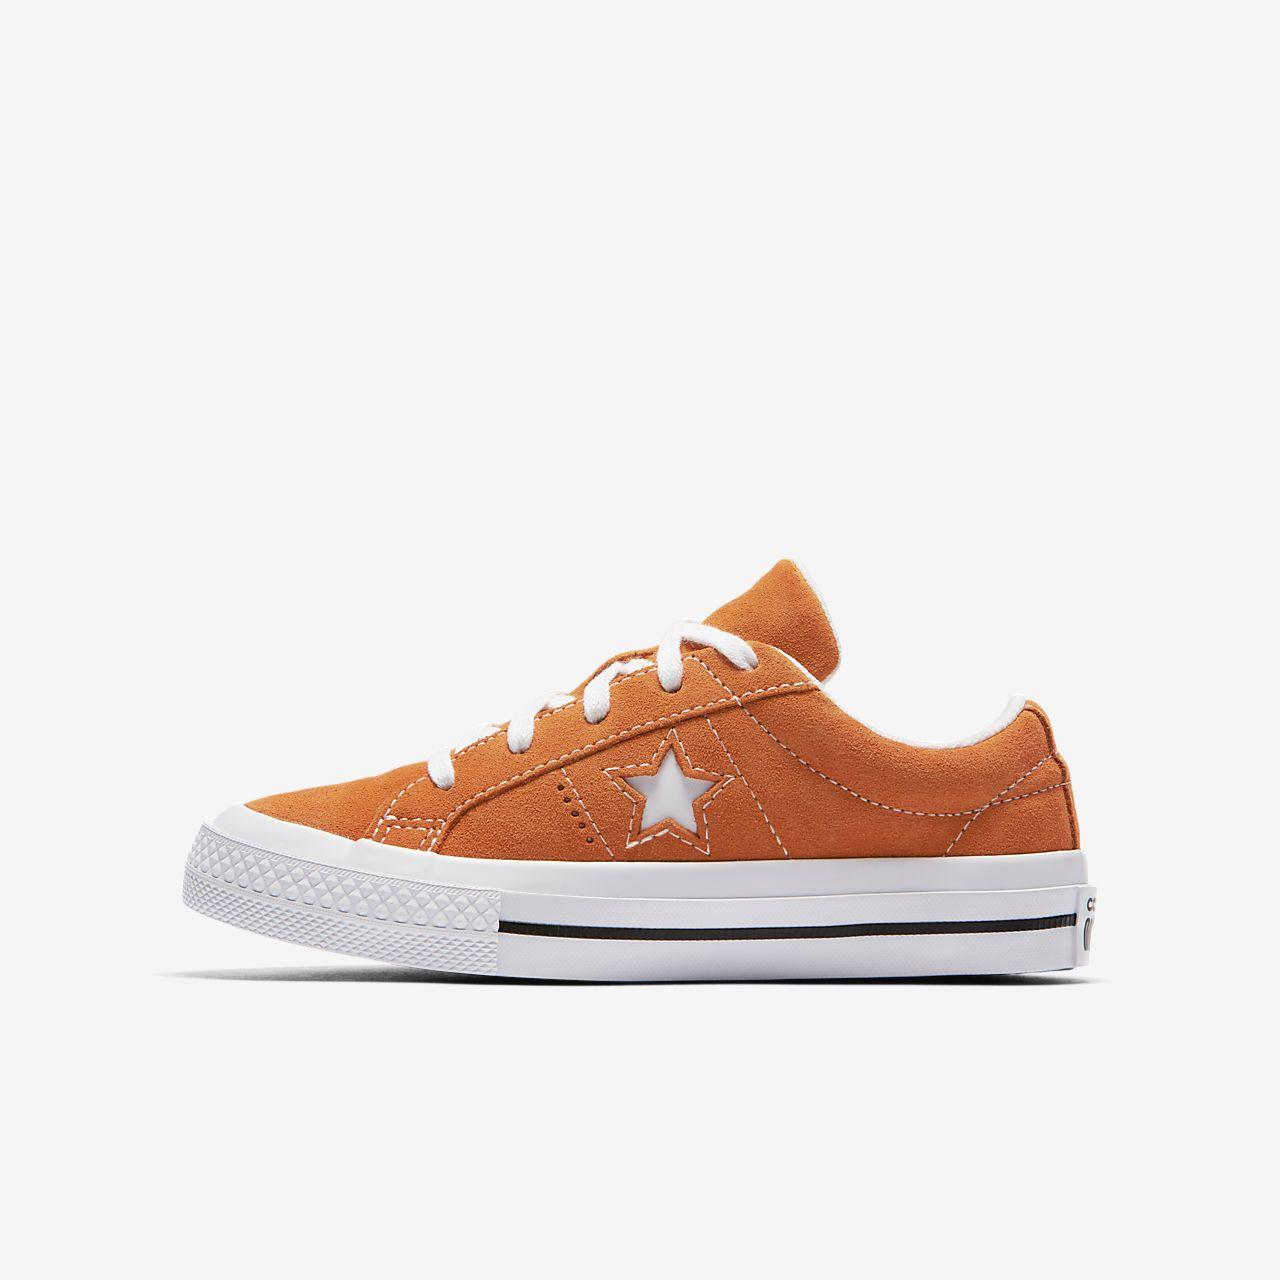 c45ef2ae755c38 ... get converse one star vintage suede low top boys shoe 1d022 2d961